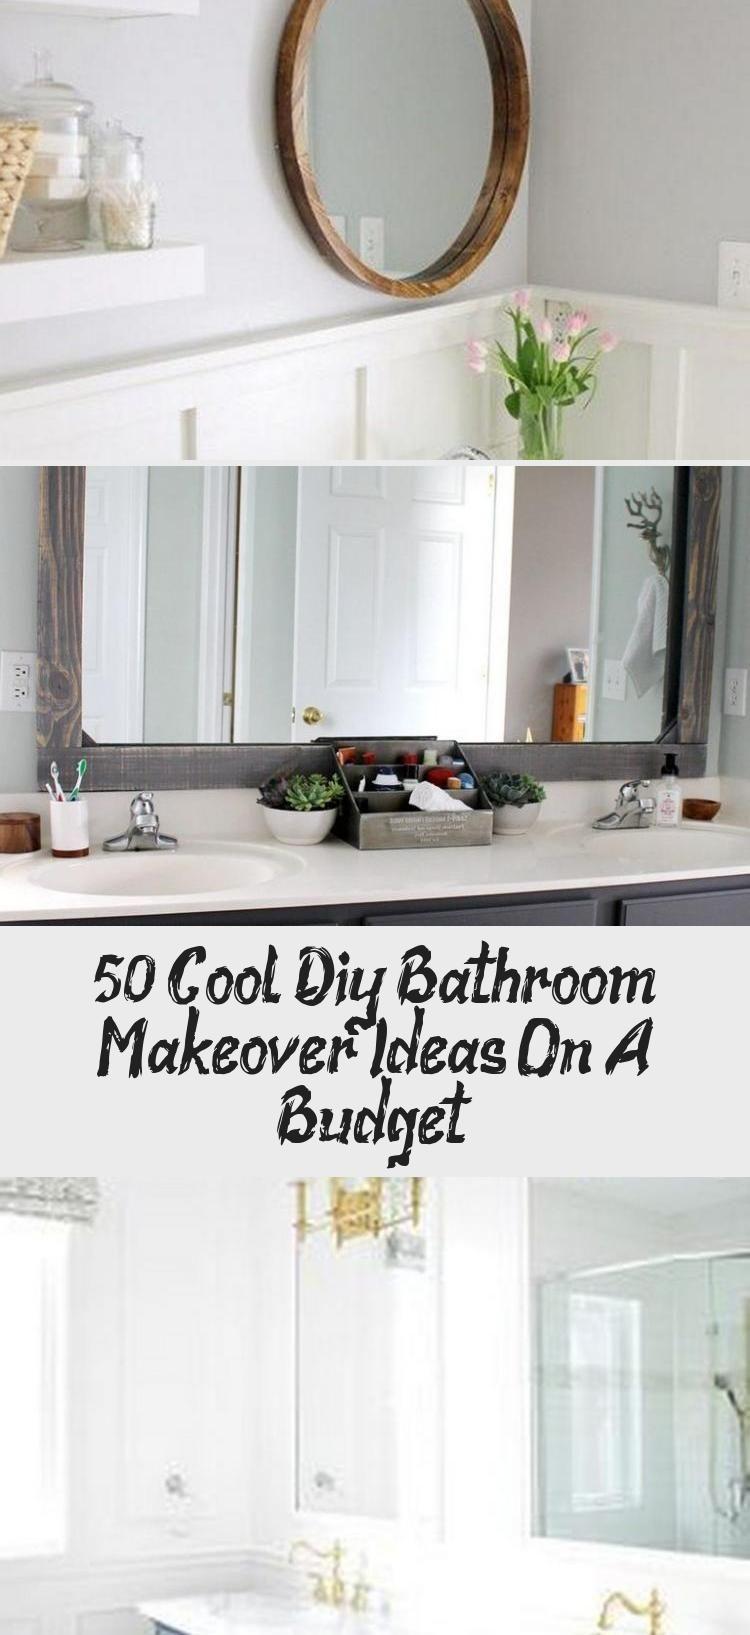 50 Cool Diy Bathroom Makeover Ideas On A Budget Bathroom Bathroommakeover Ba Bathroom Bathroommake In 2020 Diy Bathroom Makeover Bathroom Makeover Diy Bathroom